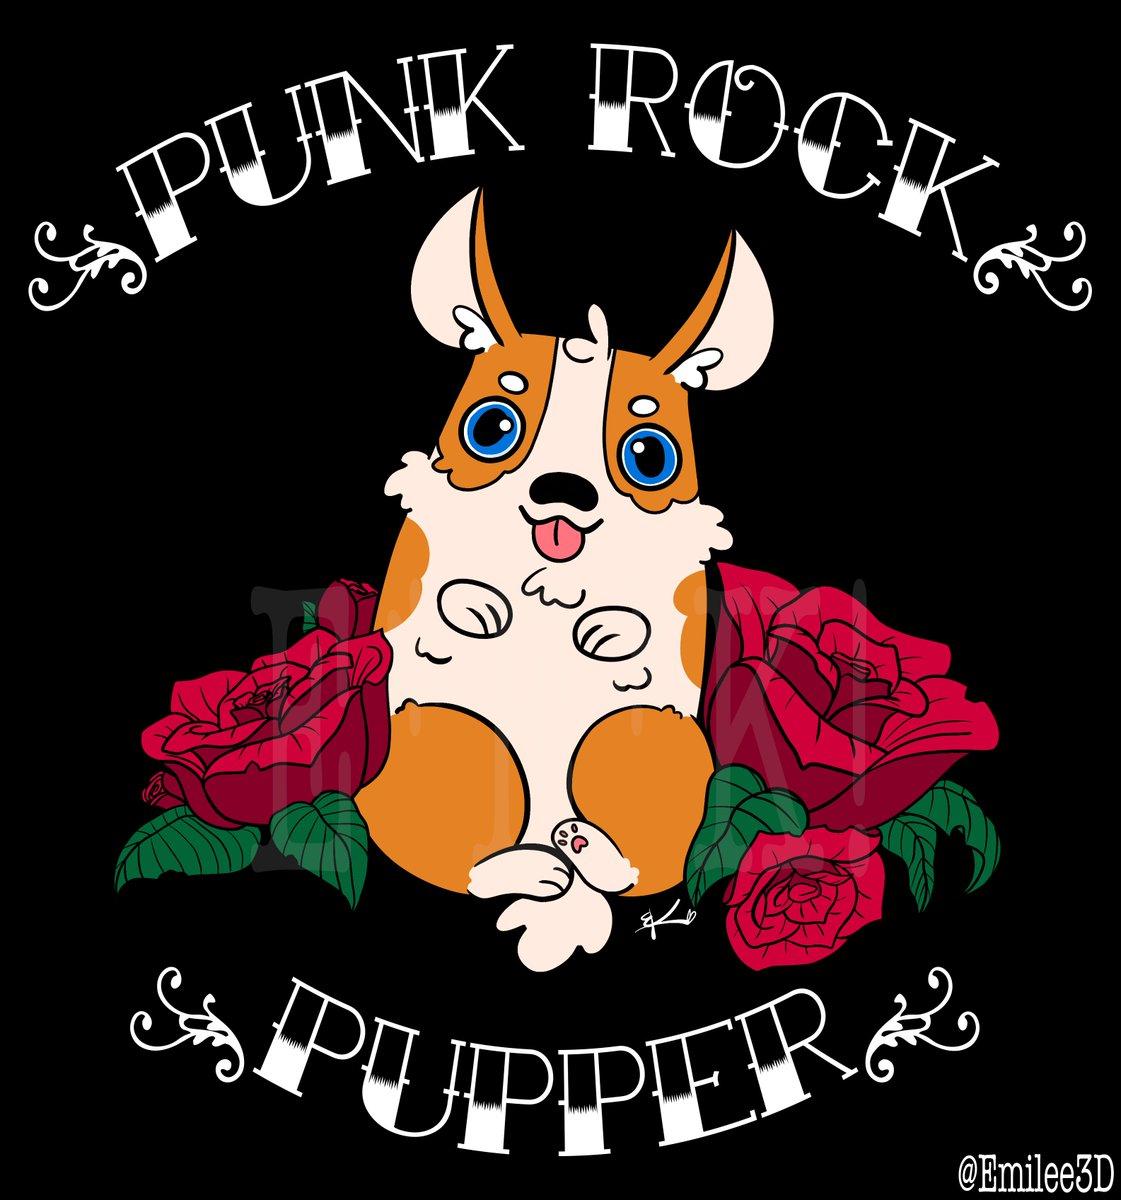 Punk Rock Pupper merchandise graphic design